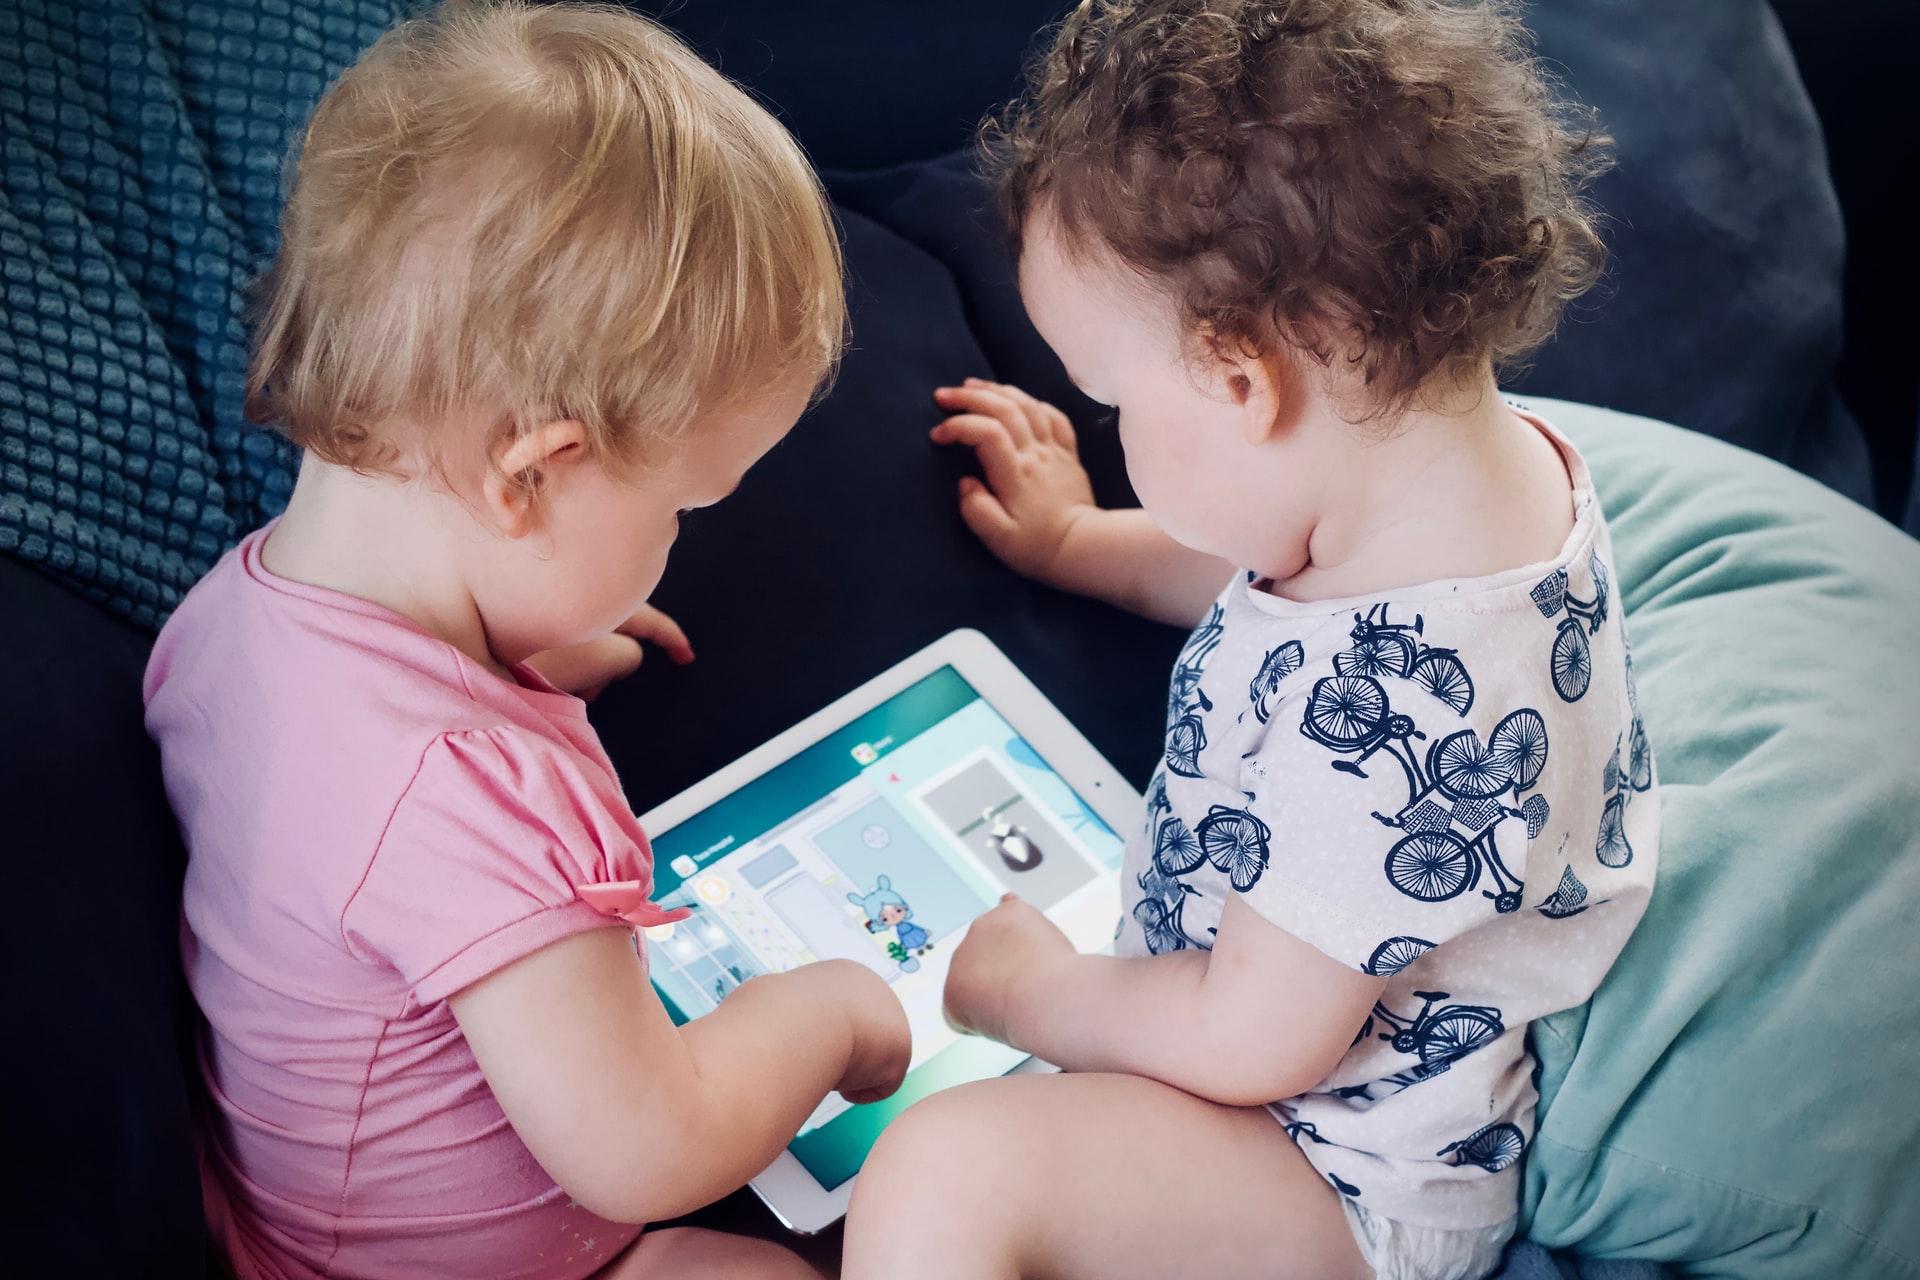 dun educational apps for kids